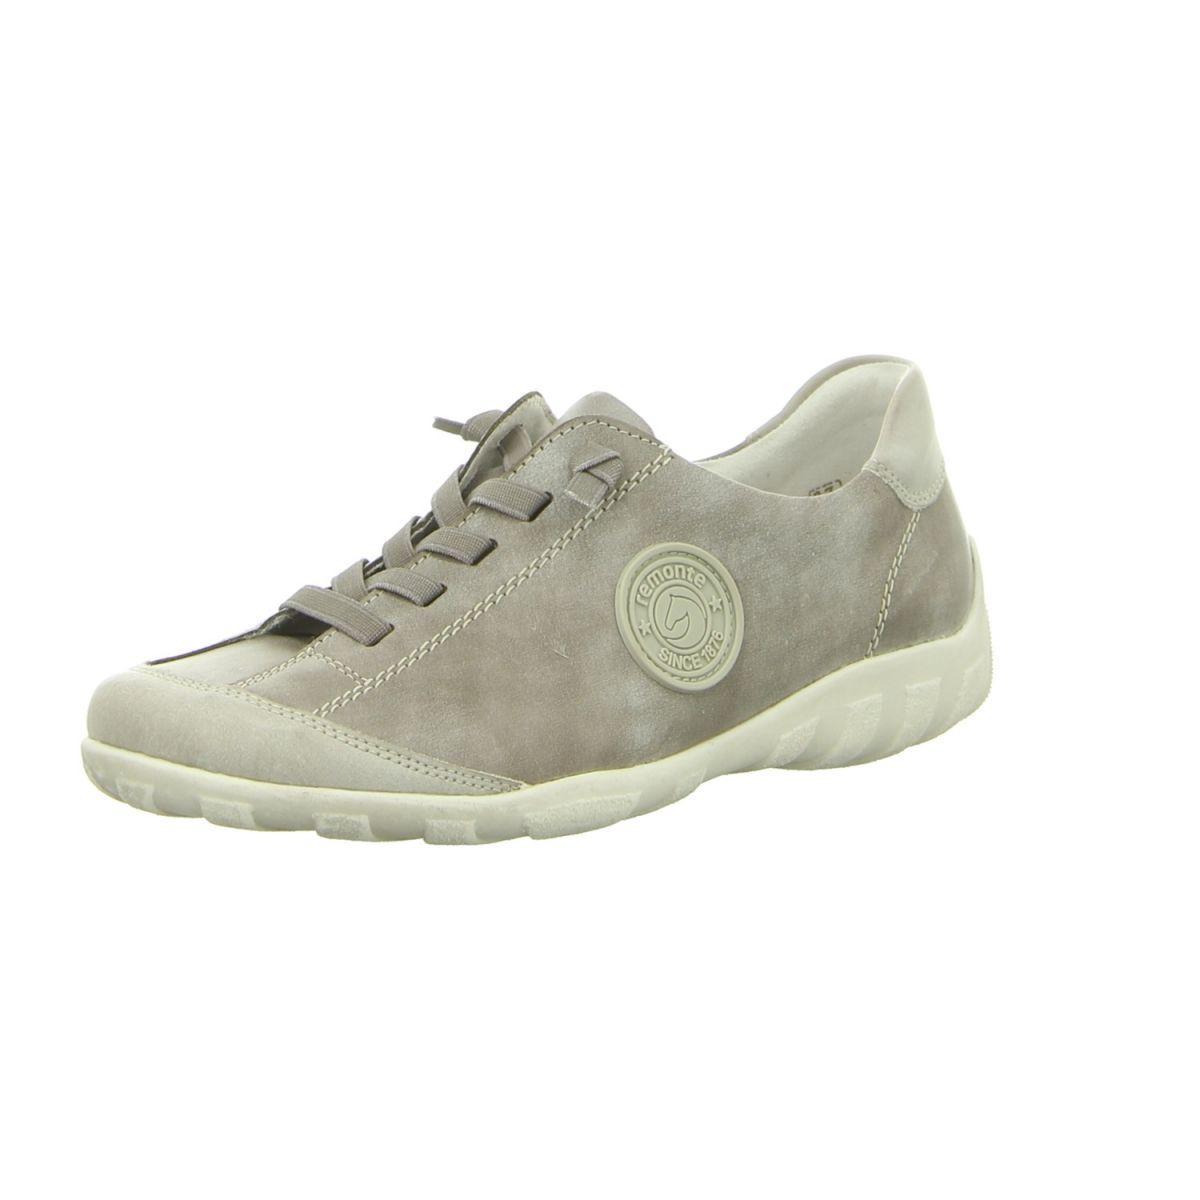 Femmes R3445 Sneaker Remonte rNVeniVYv